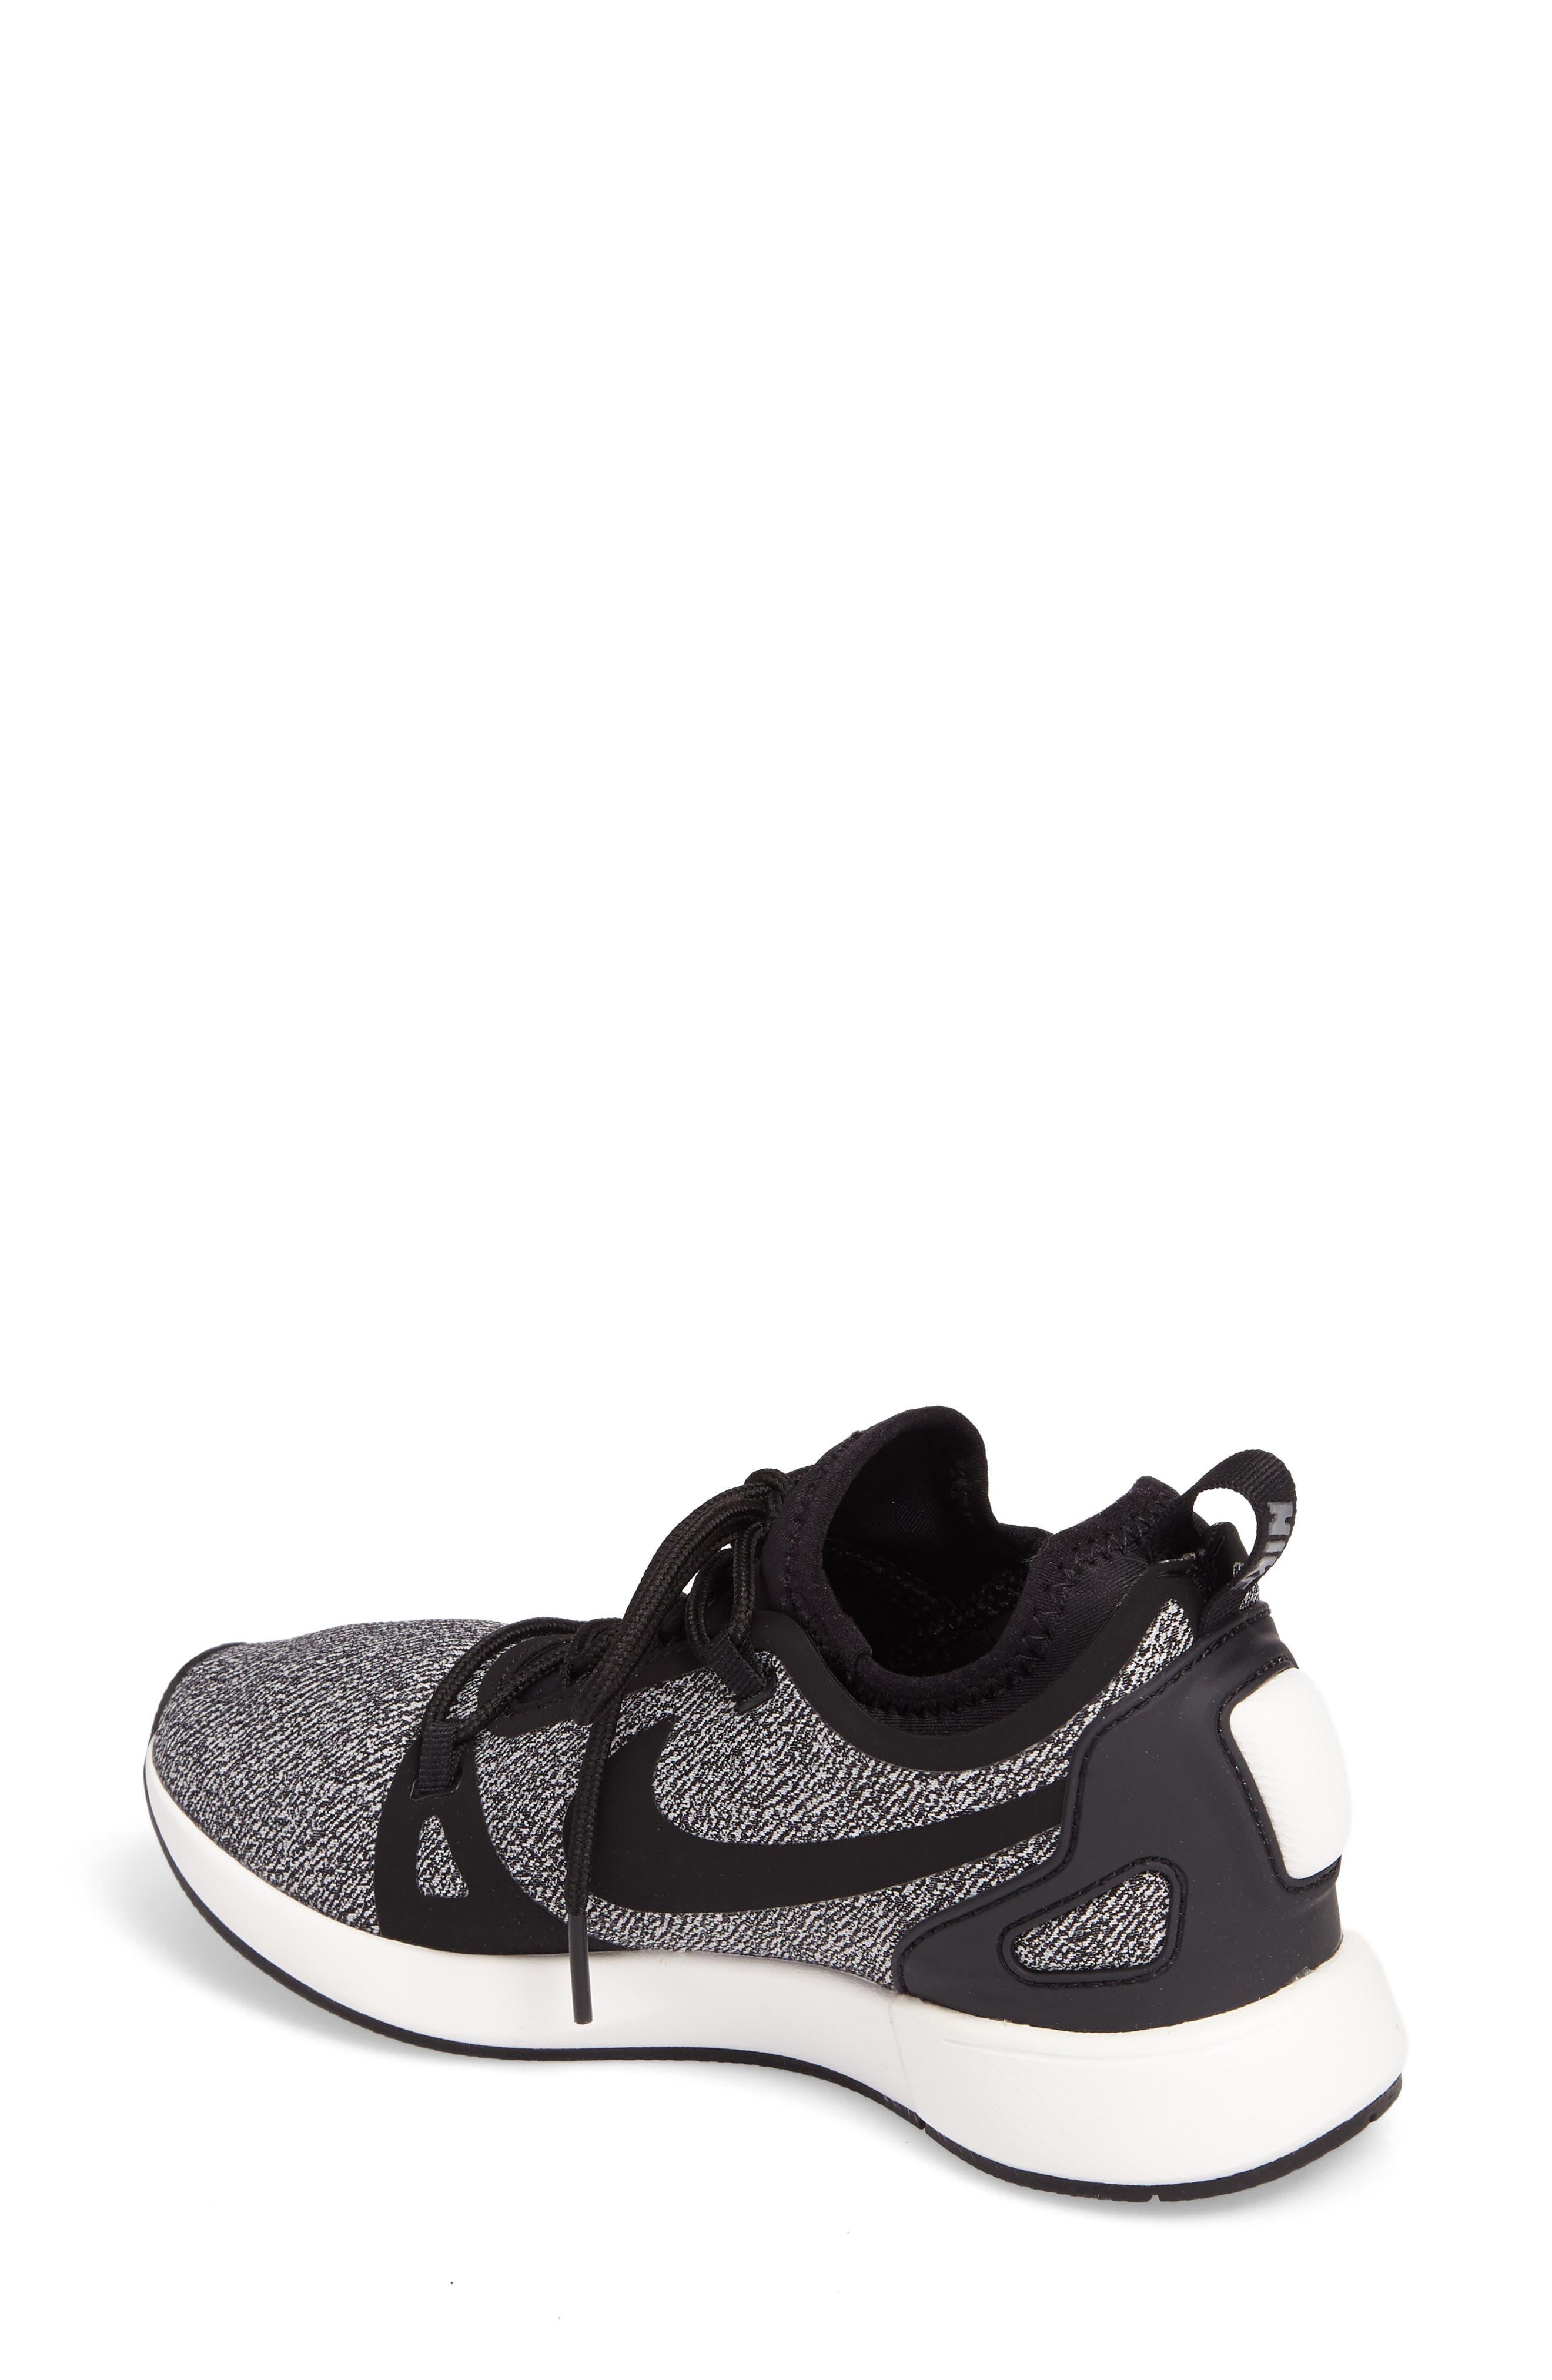 Alternate Image 2  - Nike Duel Racer Knit Sneaker (Women)